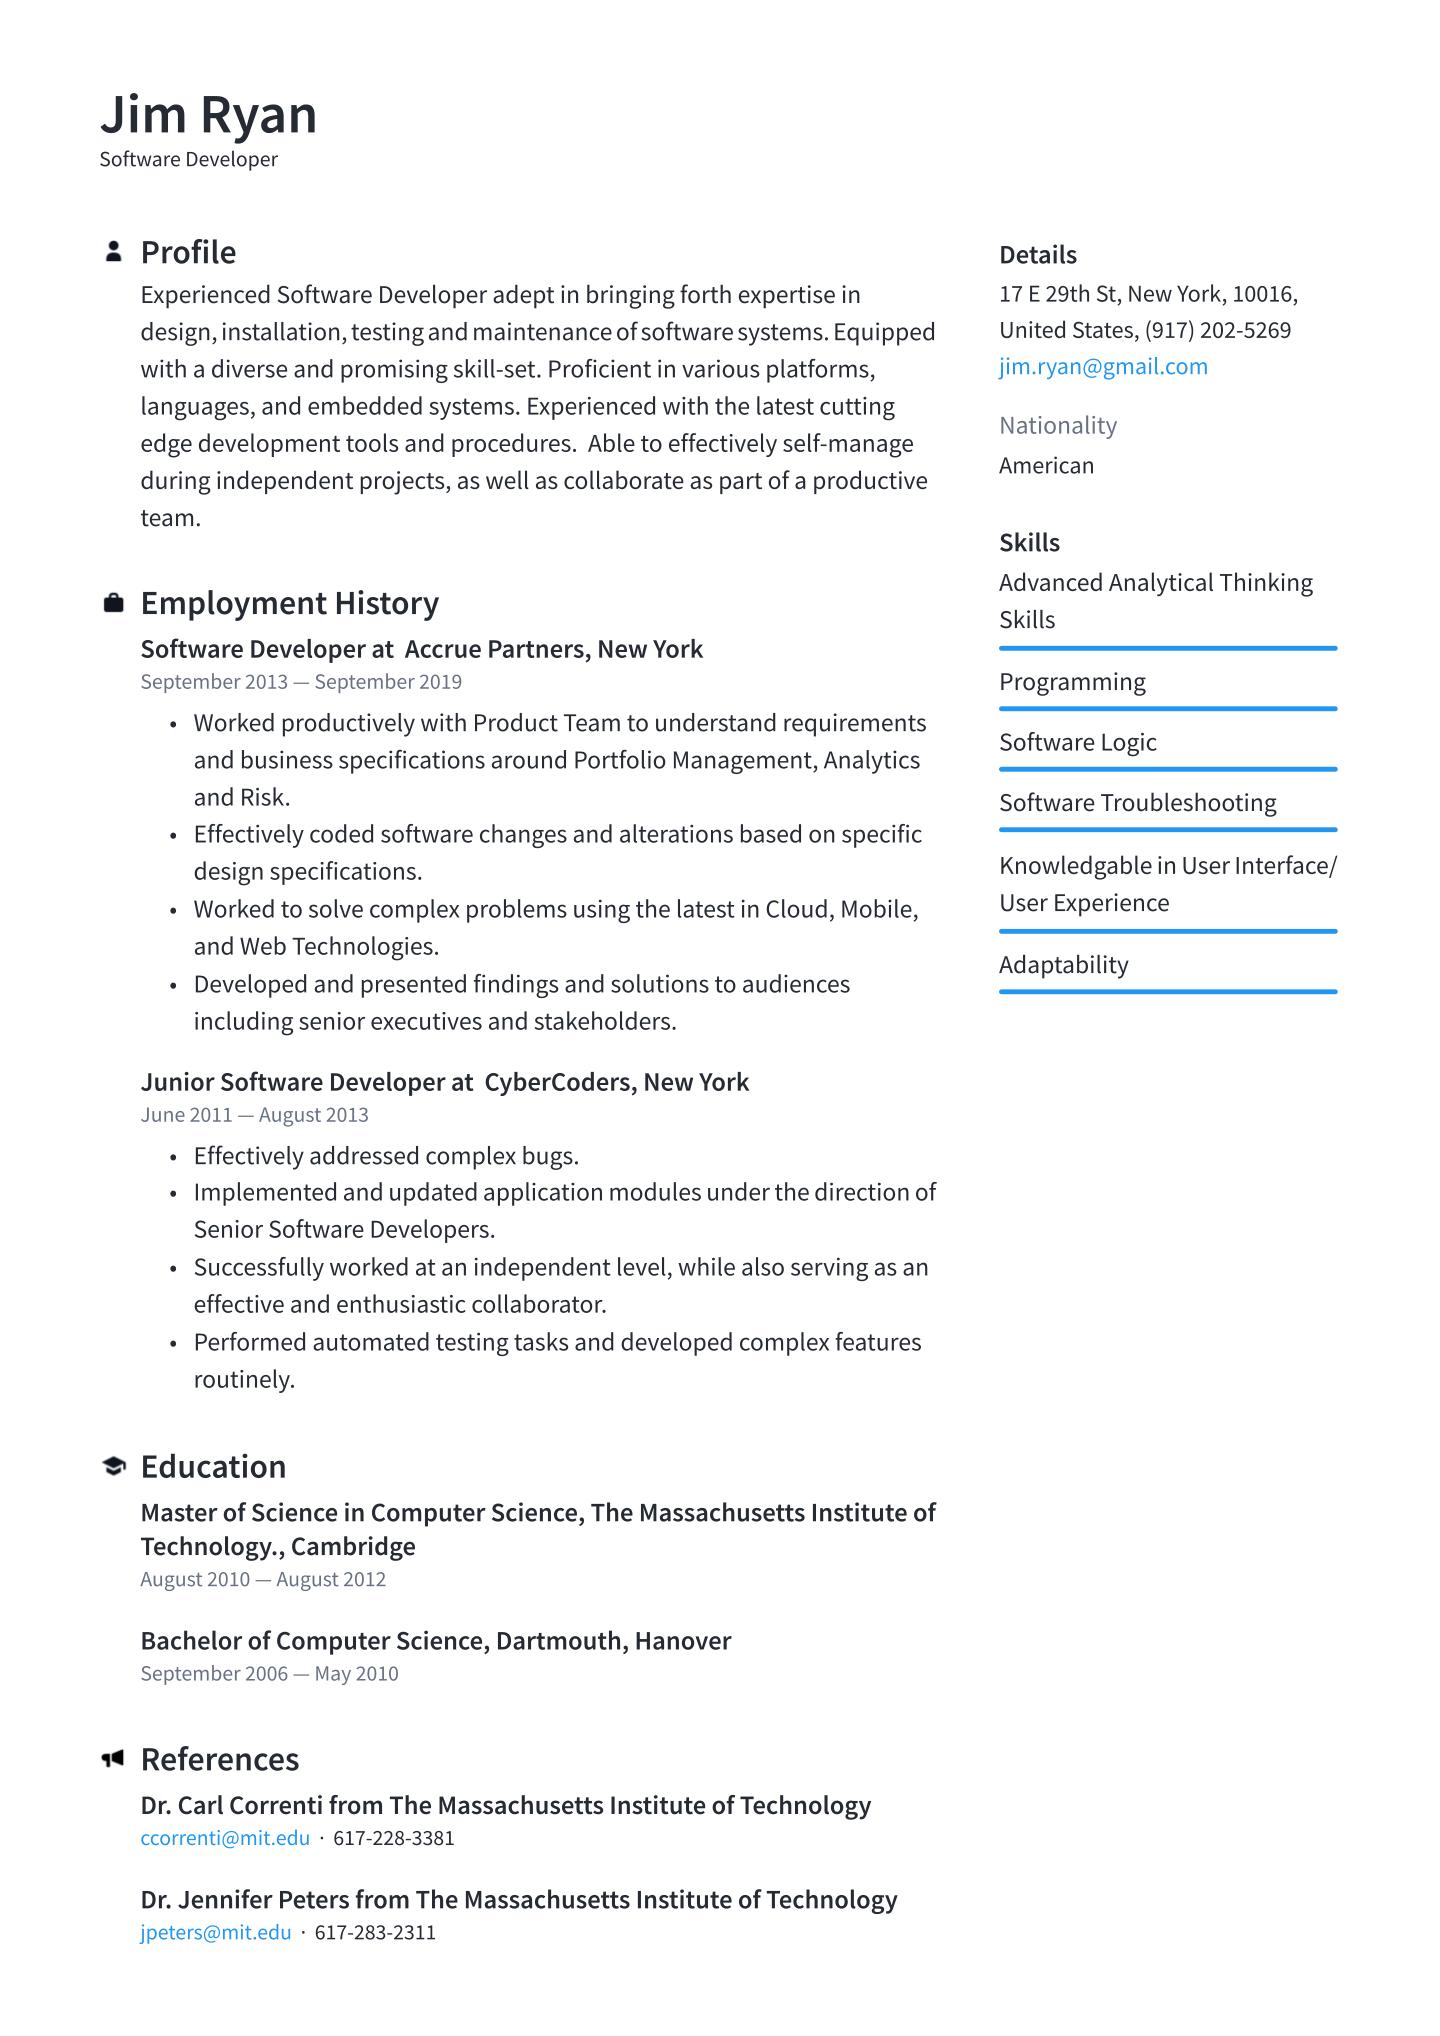 Resume Templates Software Engineer 5 Templates Example Templates Example Software Engineer Resume Templates Resume Template